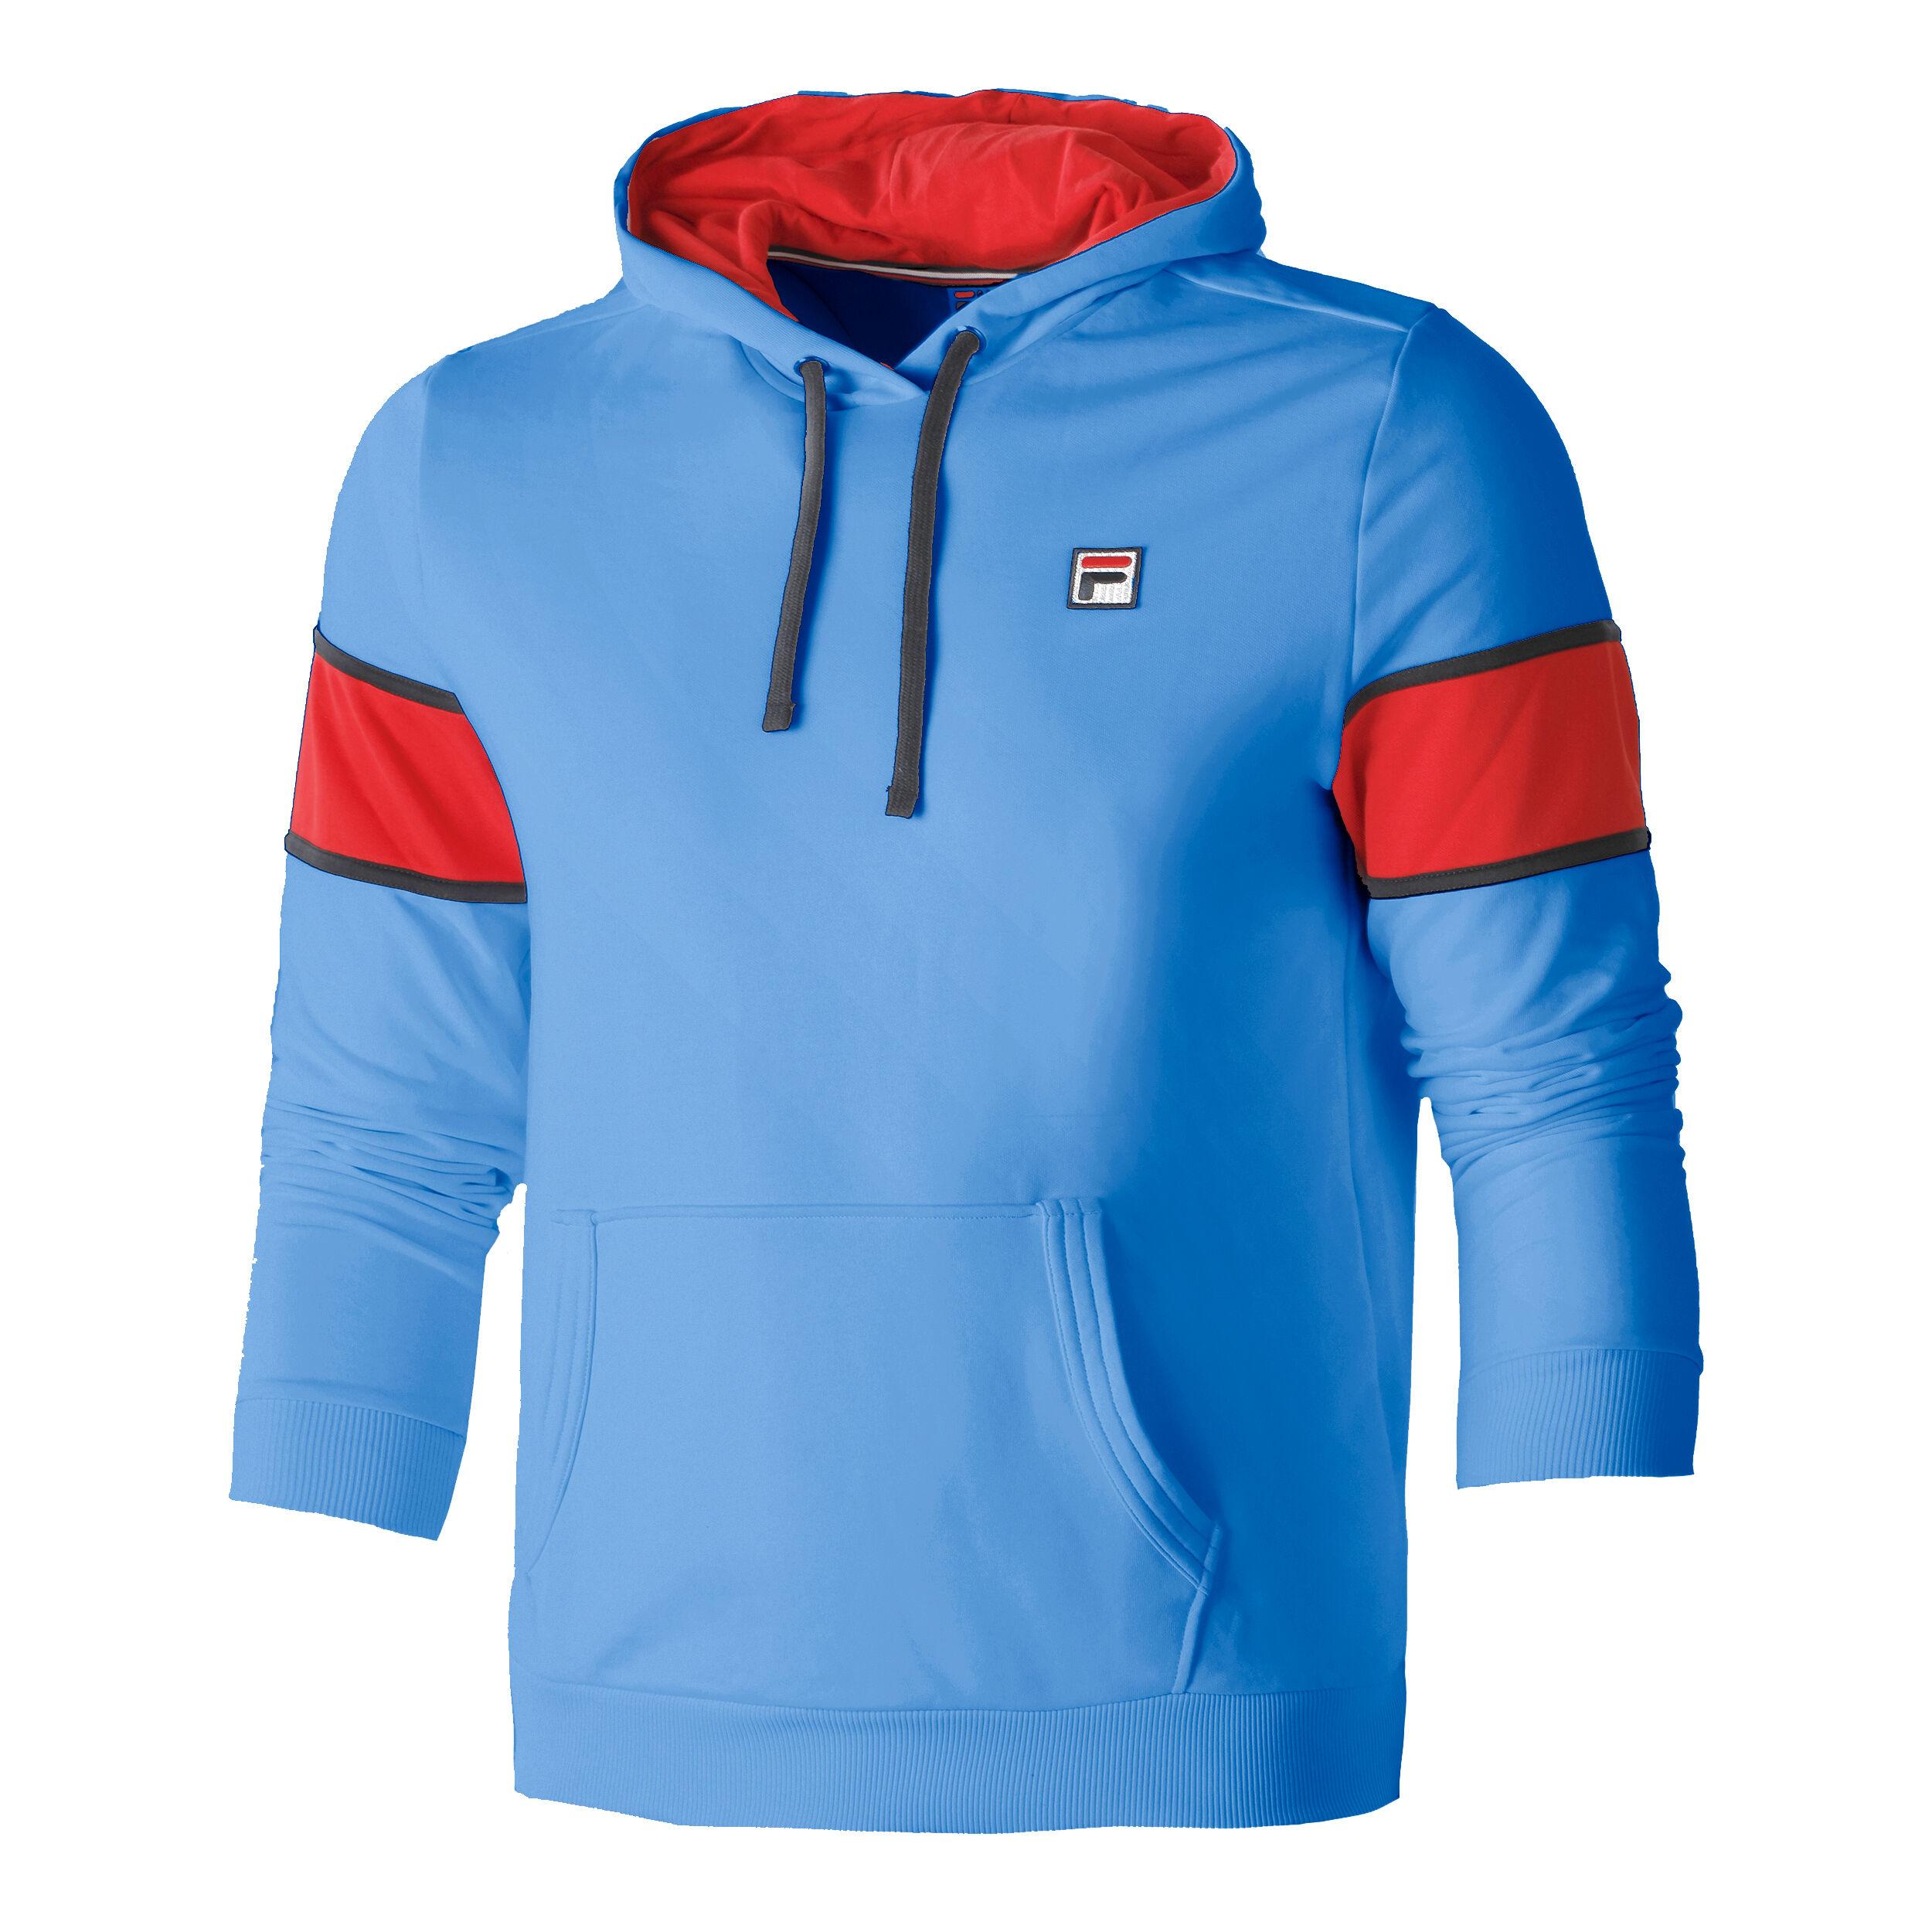 Fila Randy Sweatjacke Herren Rot, Blau online kaufen